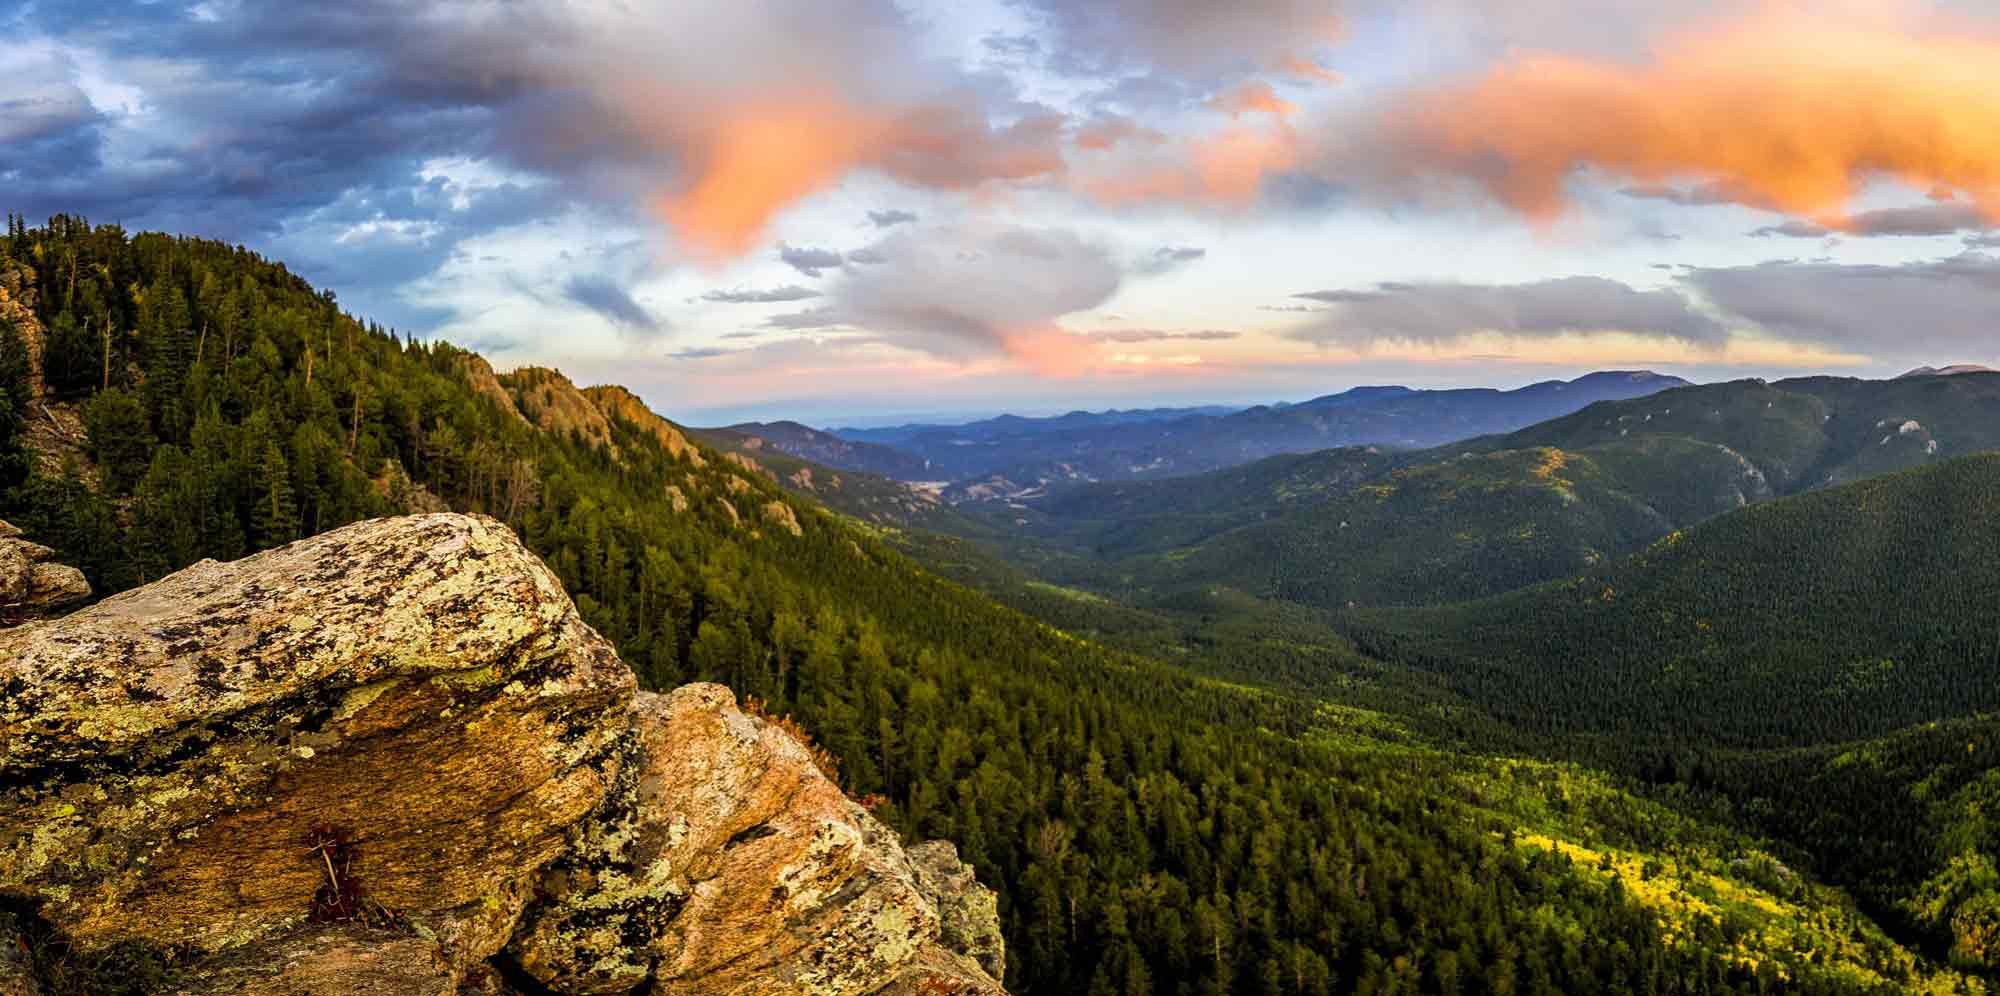 Mount Evans Ascent Idaho Springs, Colorado